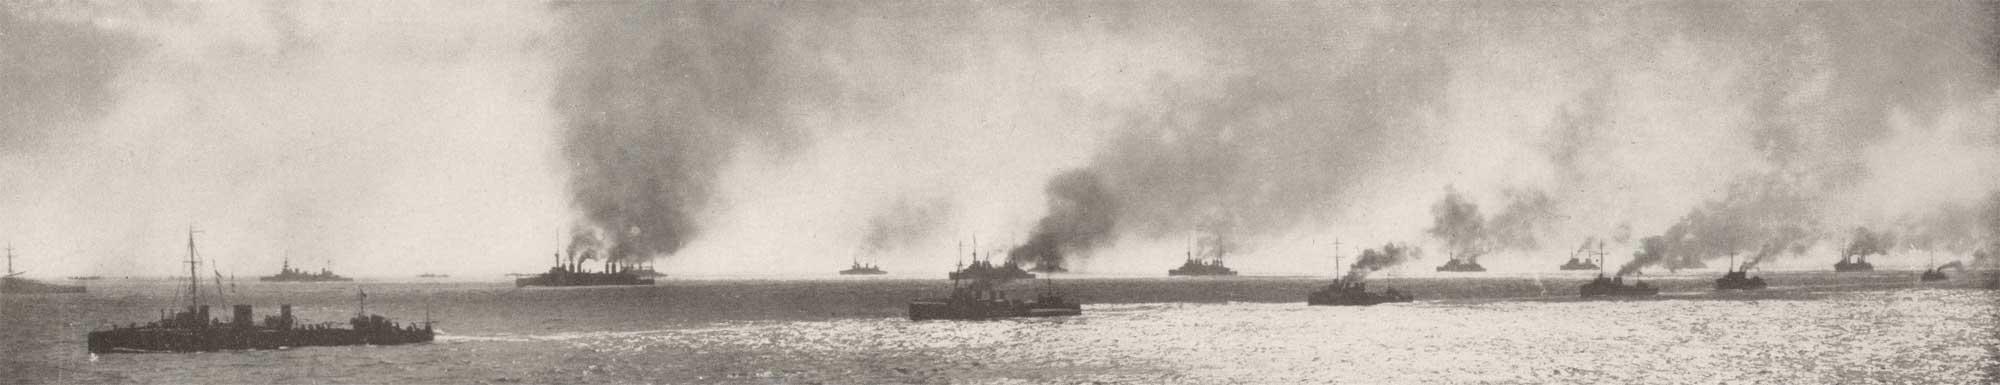 İtilaf Donanması 18 Mart 1915